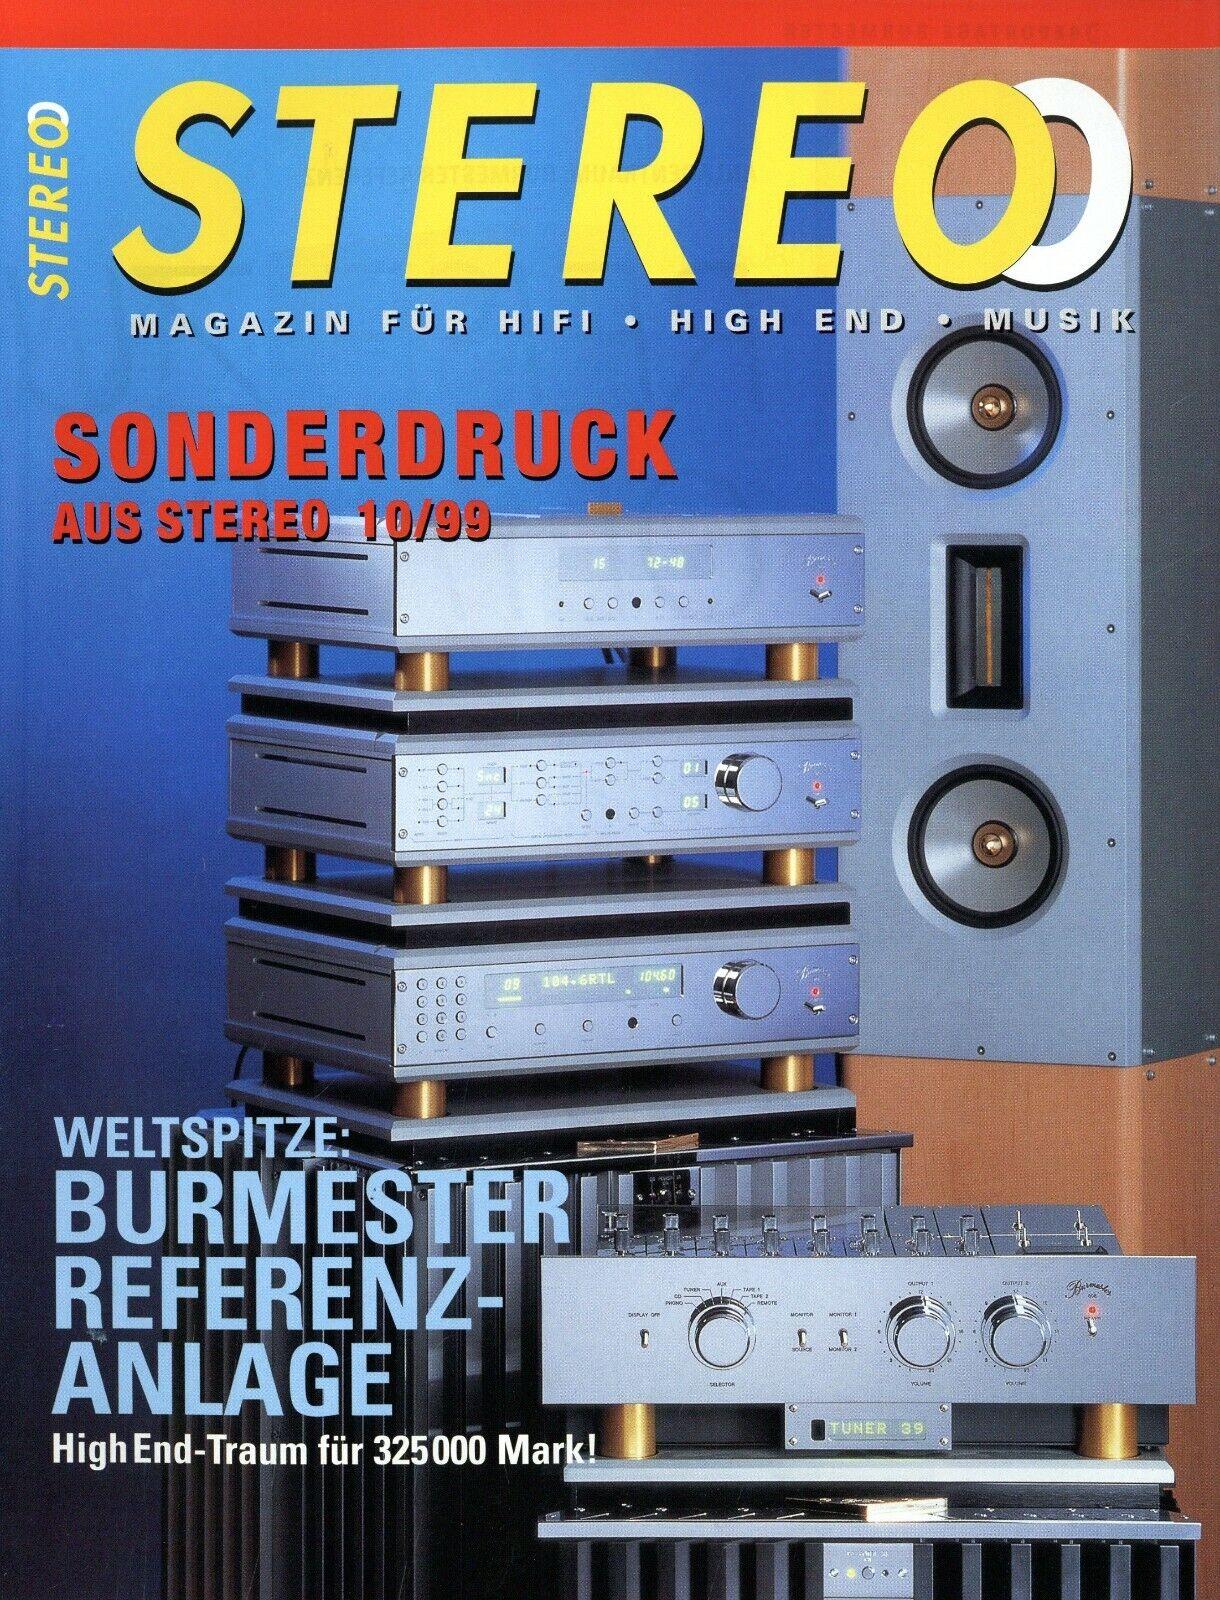 Burmester Referenz HiFi Anlage Test im Sonderdruck Stereo 1999 10/99 reprint